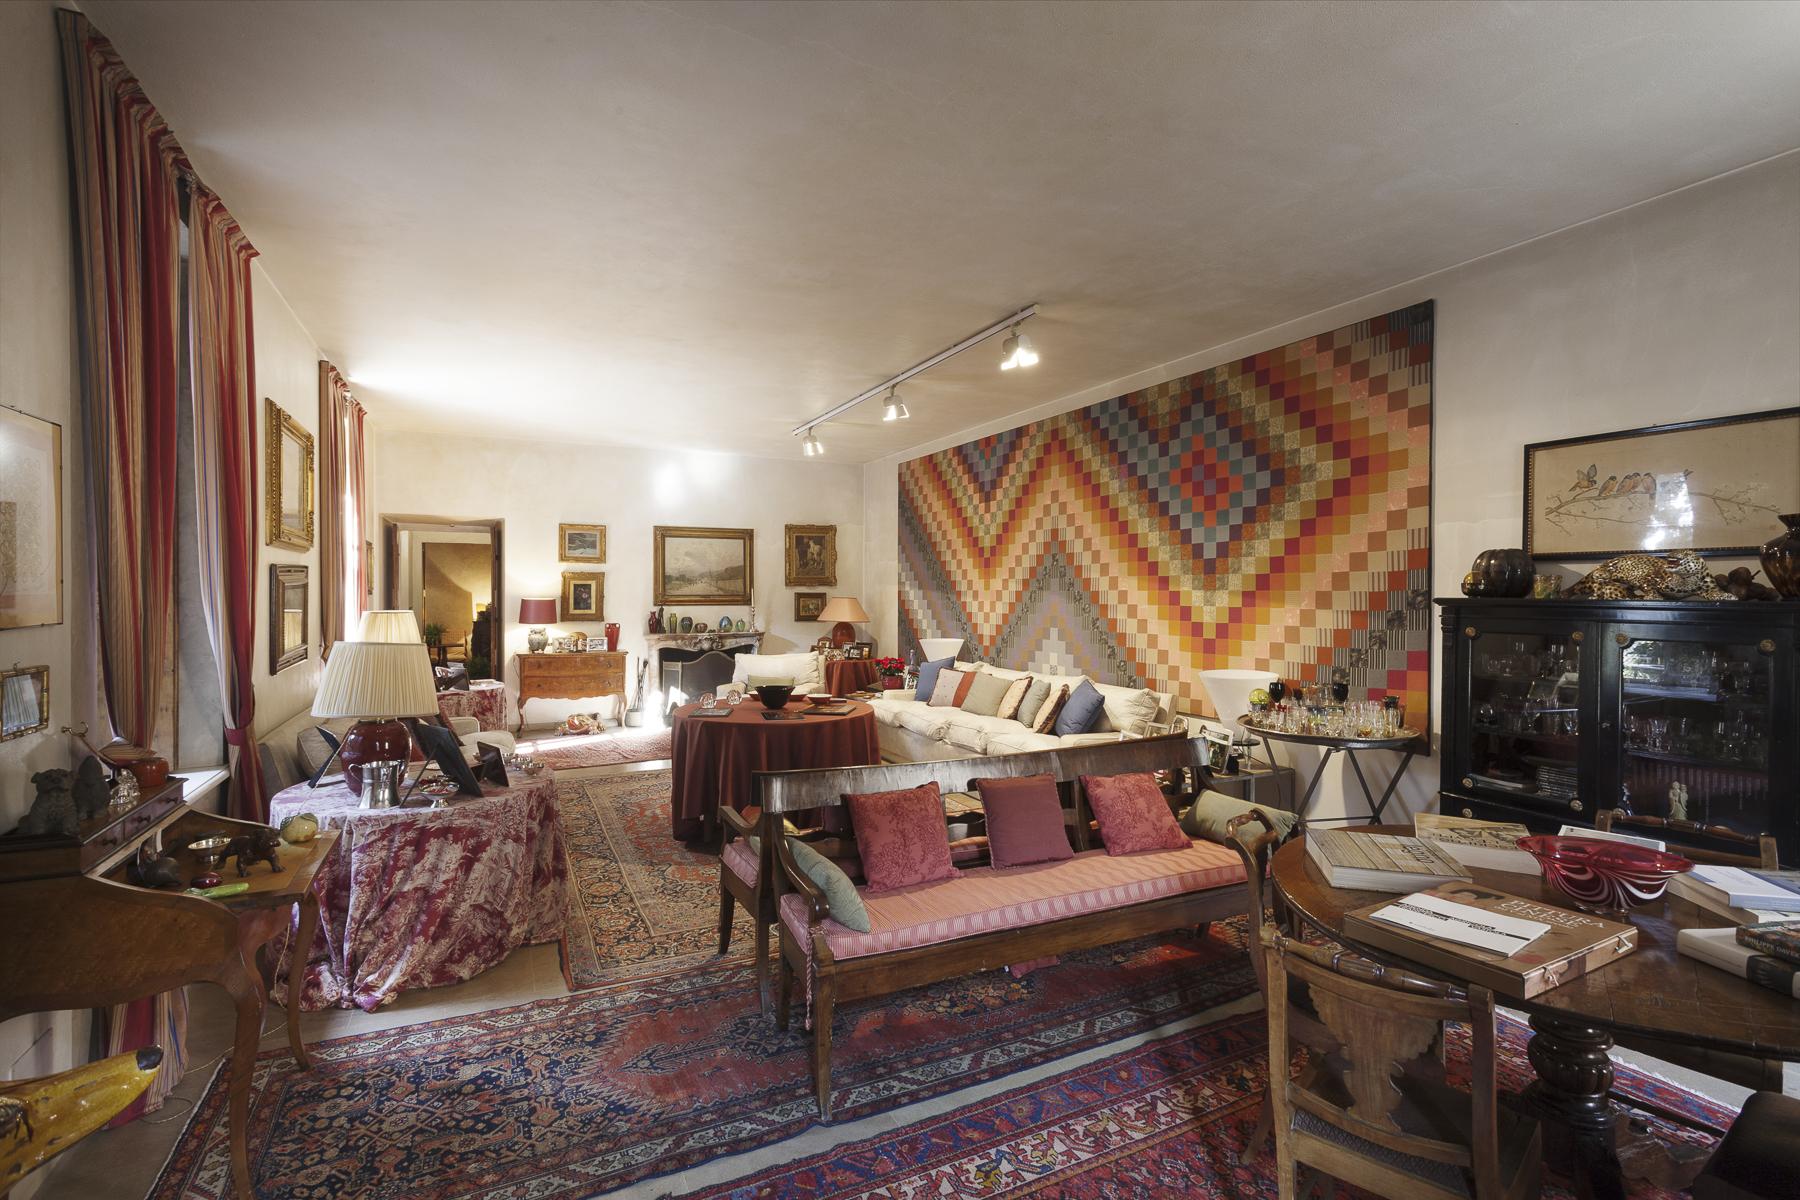 Additional photo for property listing at A fascinating XVII century Villa in Revigliasco Hill Strada Moncalieri Other Turin, Turin 10024 Italia